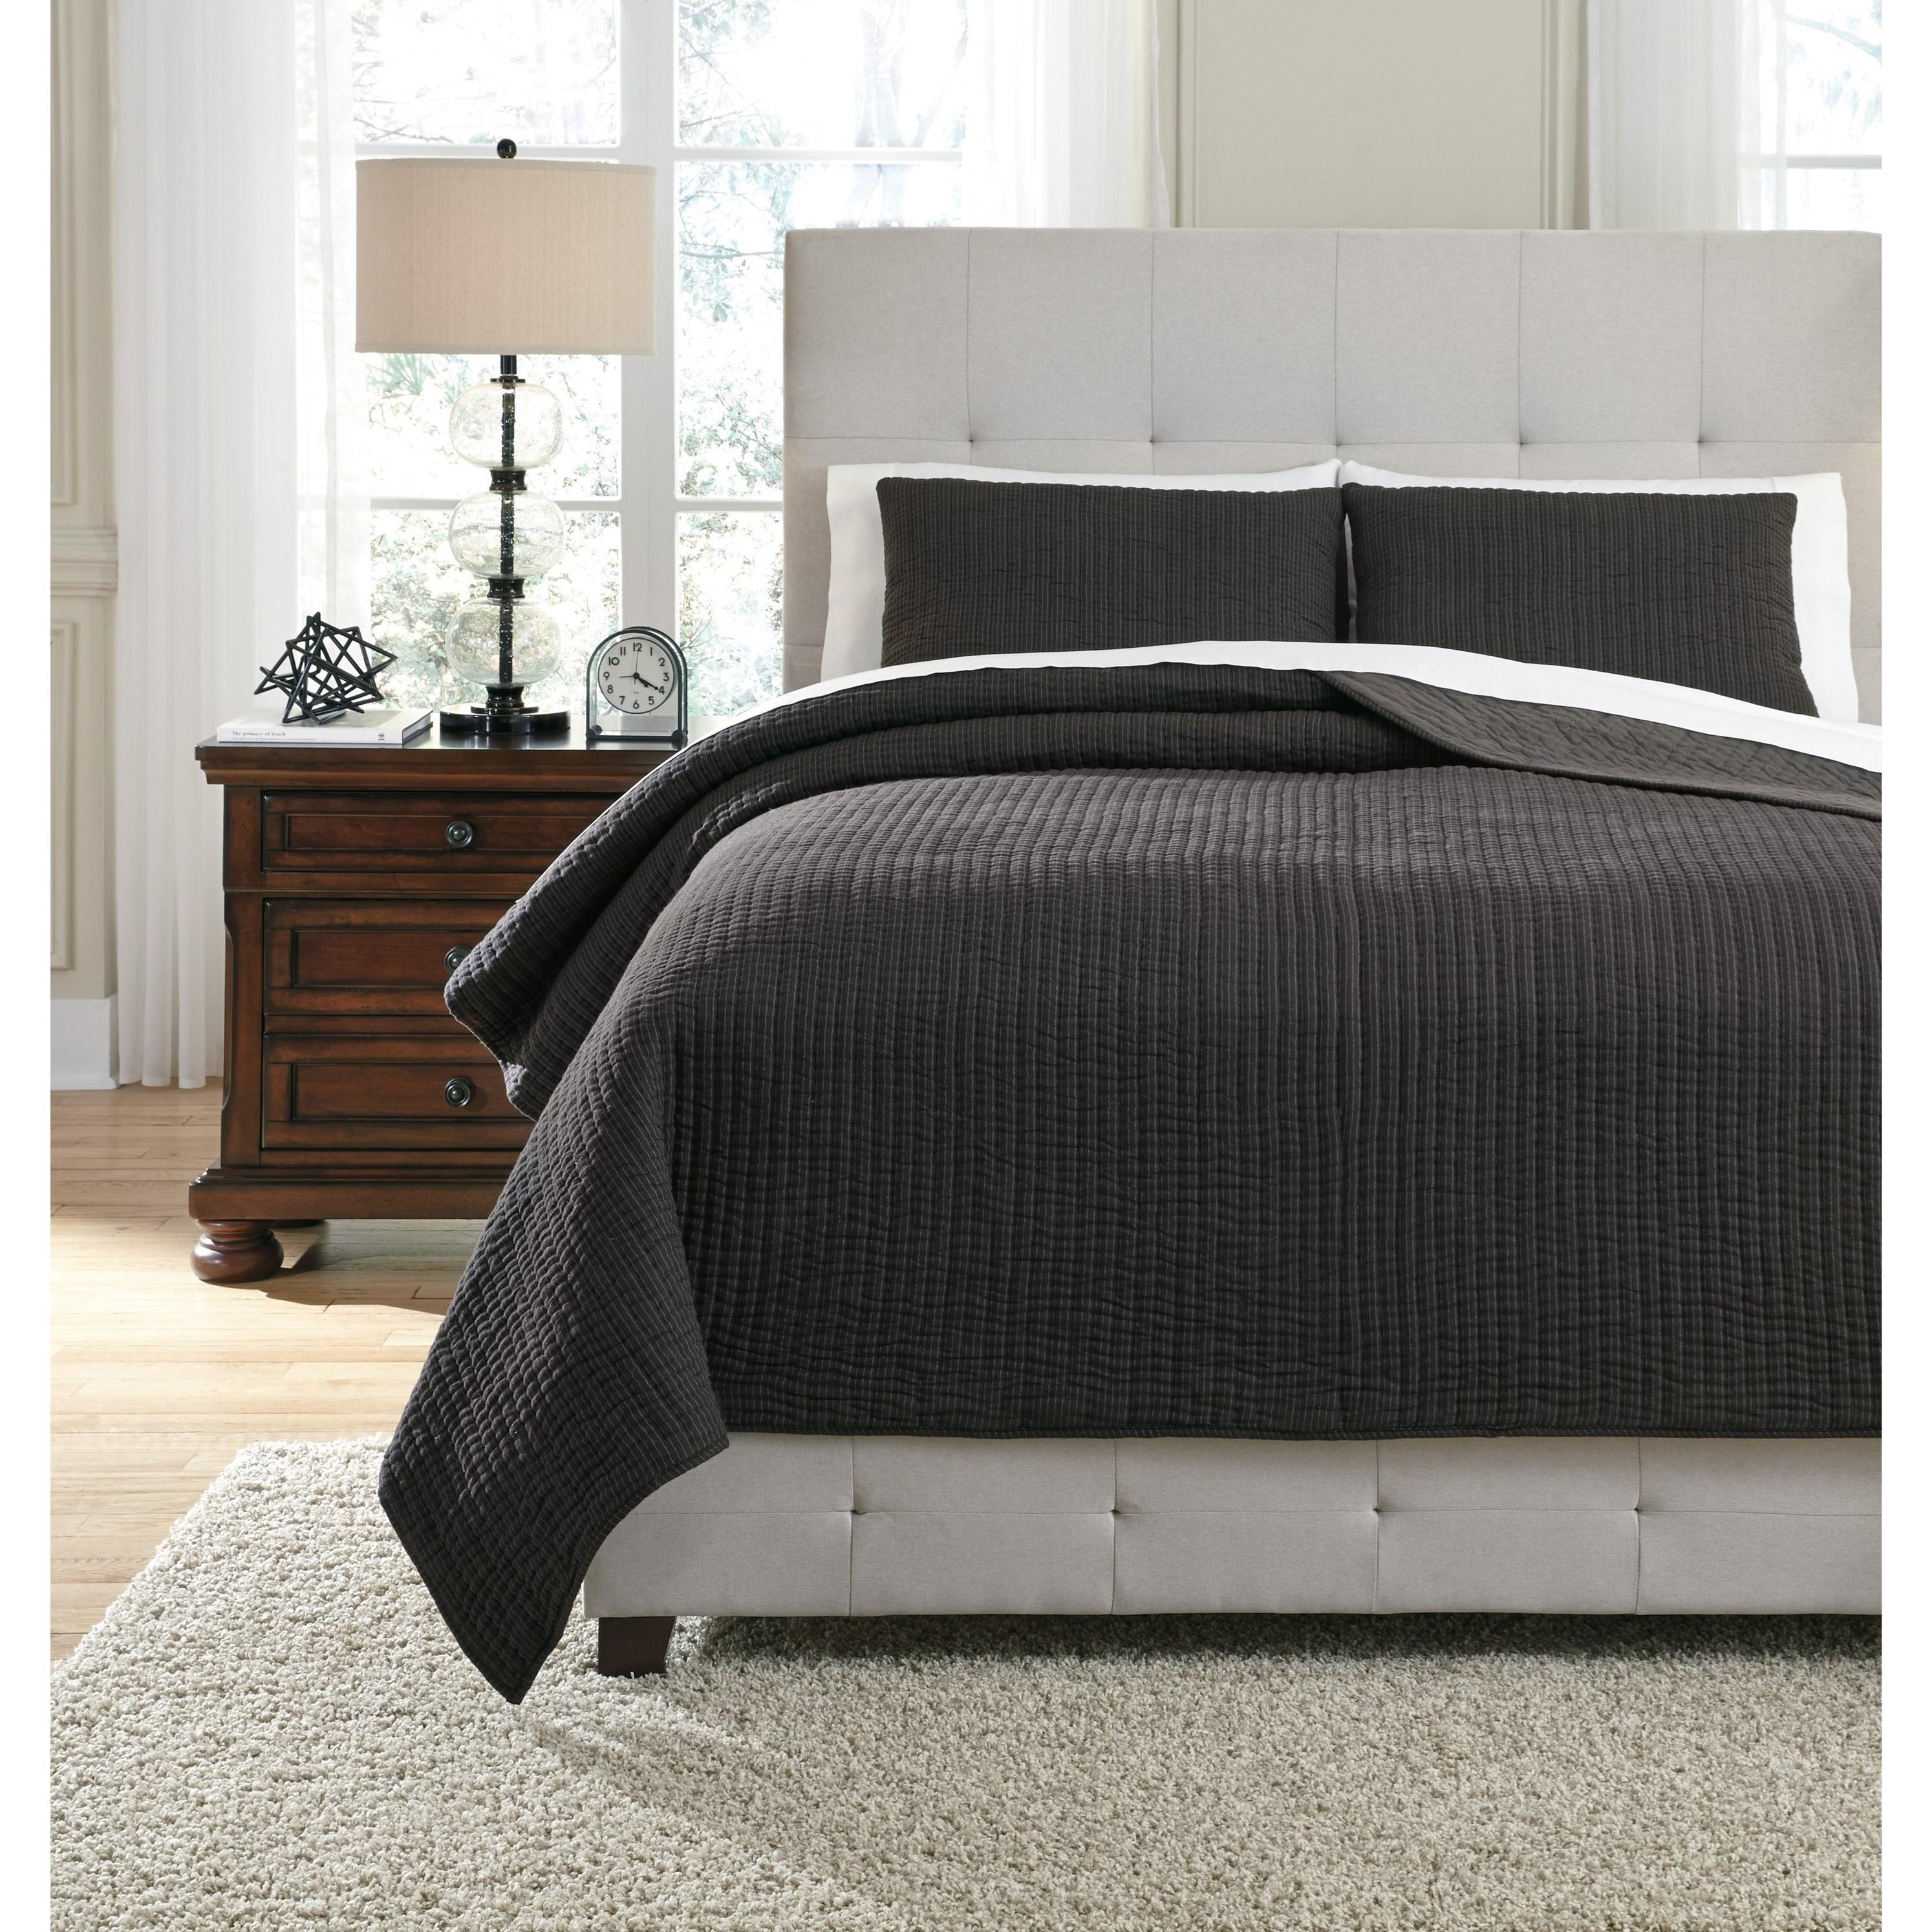 Signature Design by Ashley Bedding Sets Queen Bronx Black/Gray Coverlet Set - Item Number: Q336003Q